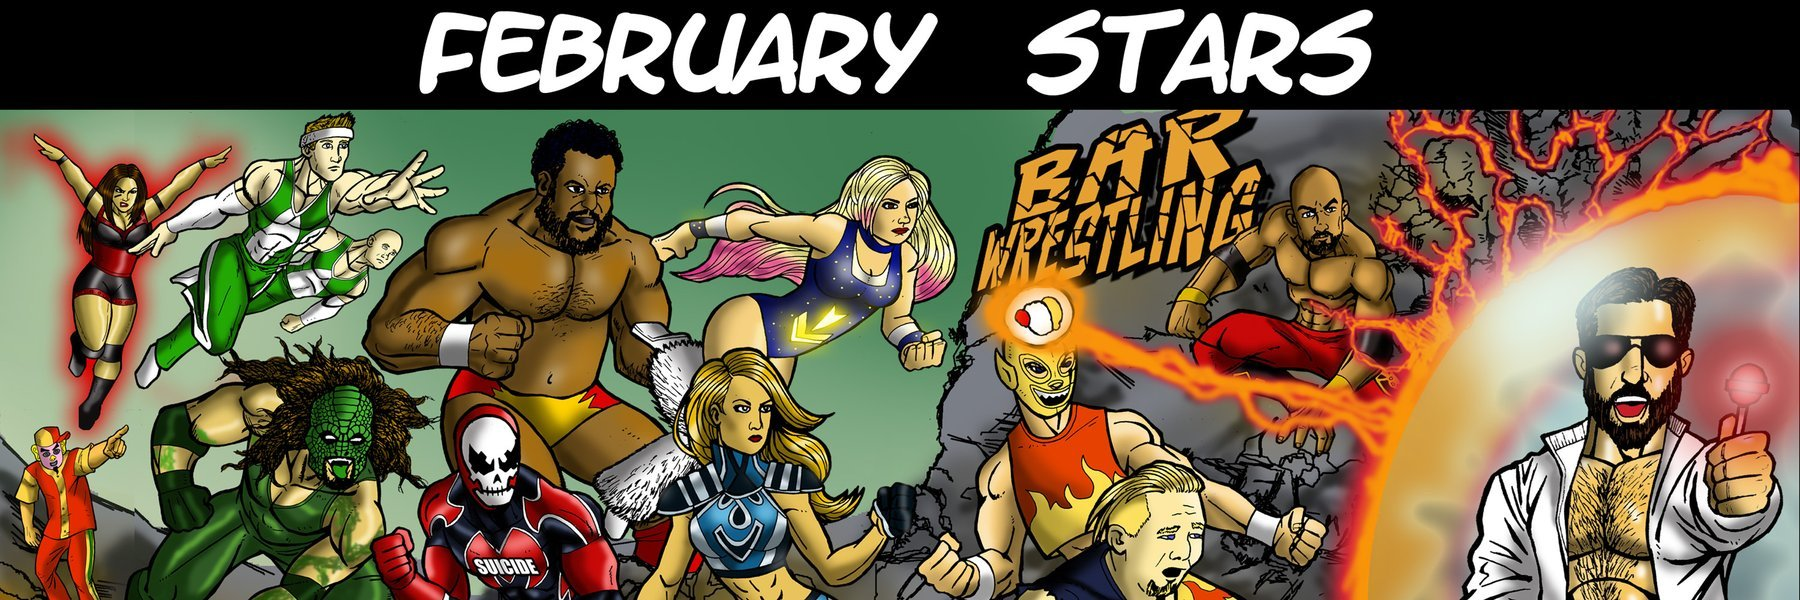 Binge on Bar Wrestling 9! Emma vs Taya Valkyrie, Joey Ryan vs Ellsworth